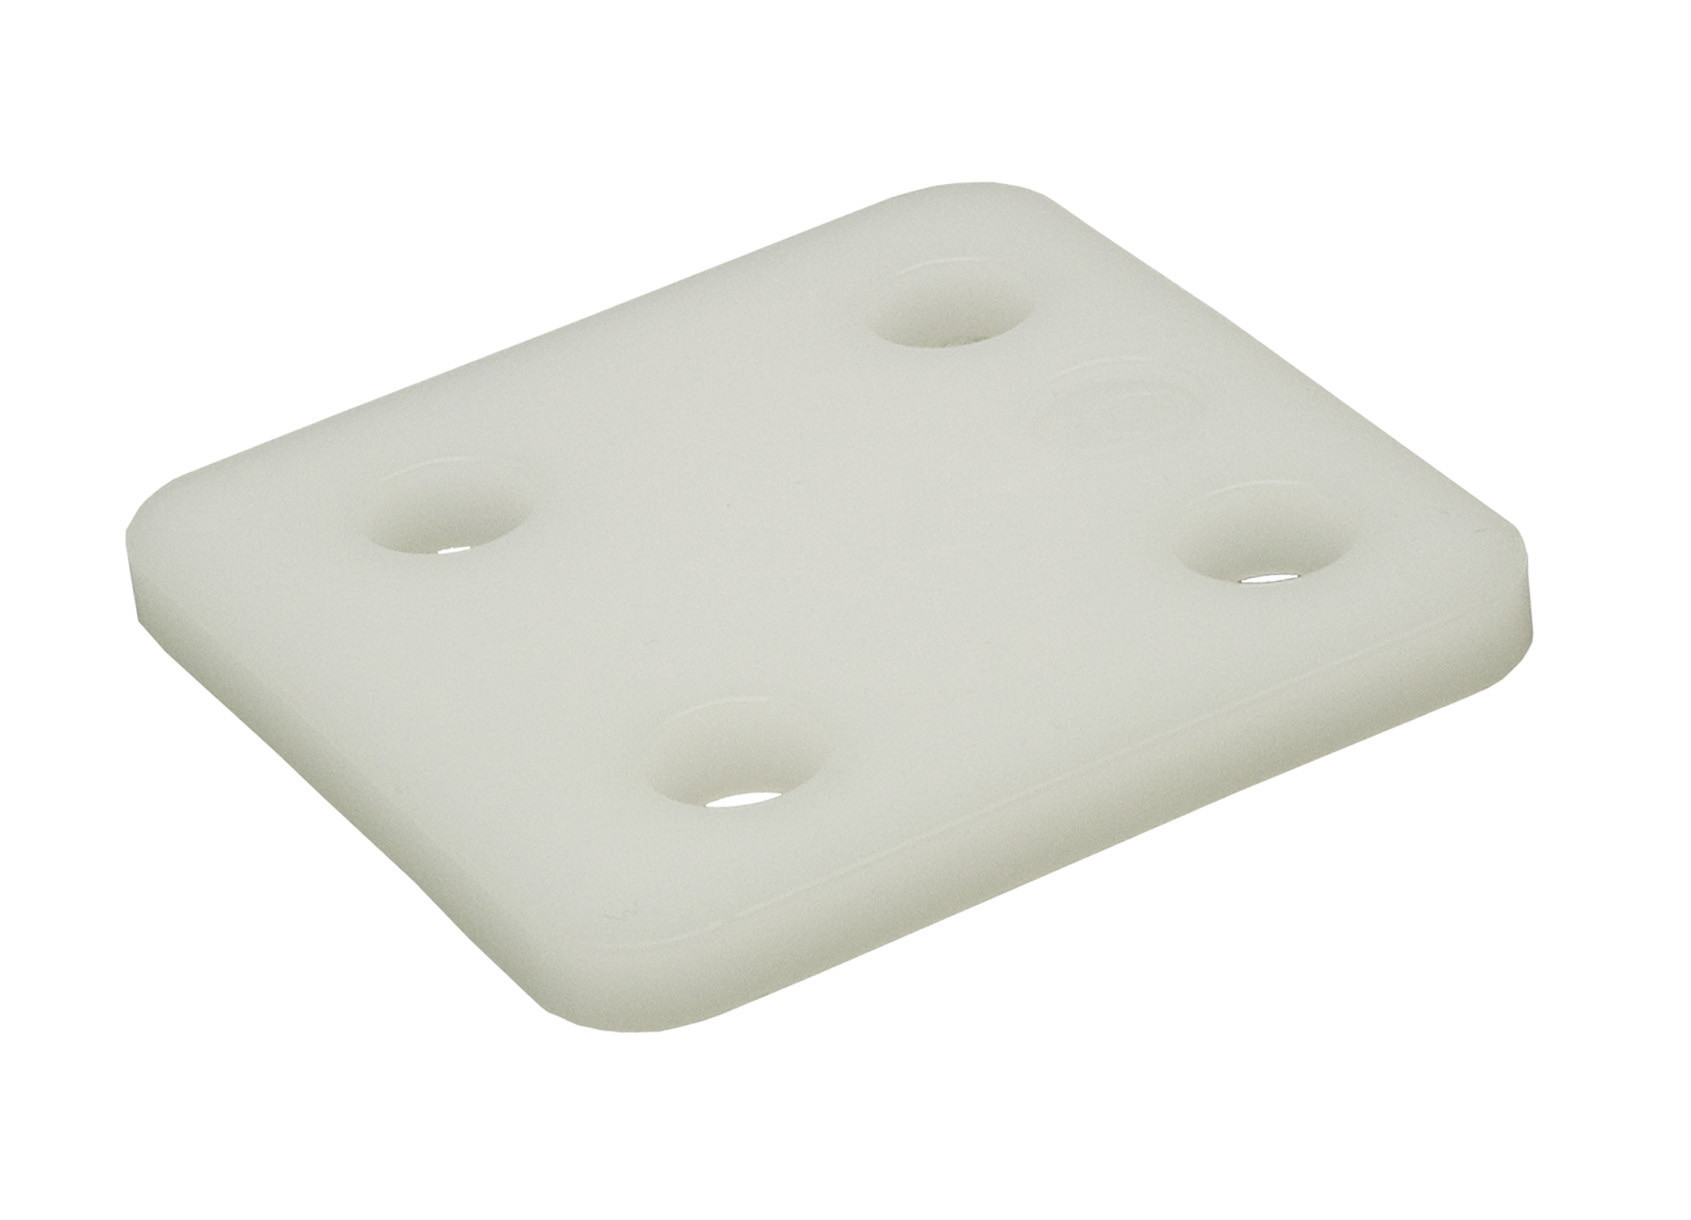 Pressure plate 6 70x70 KS